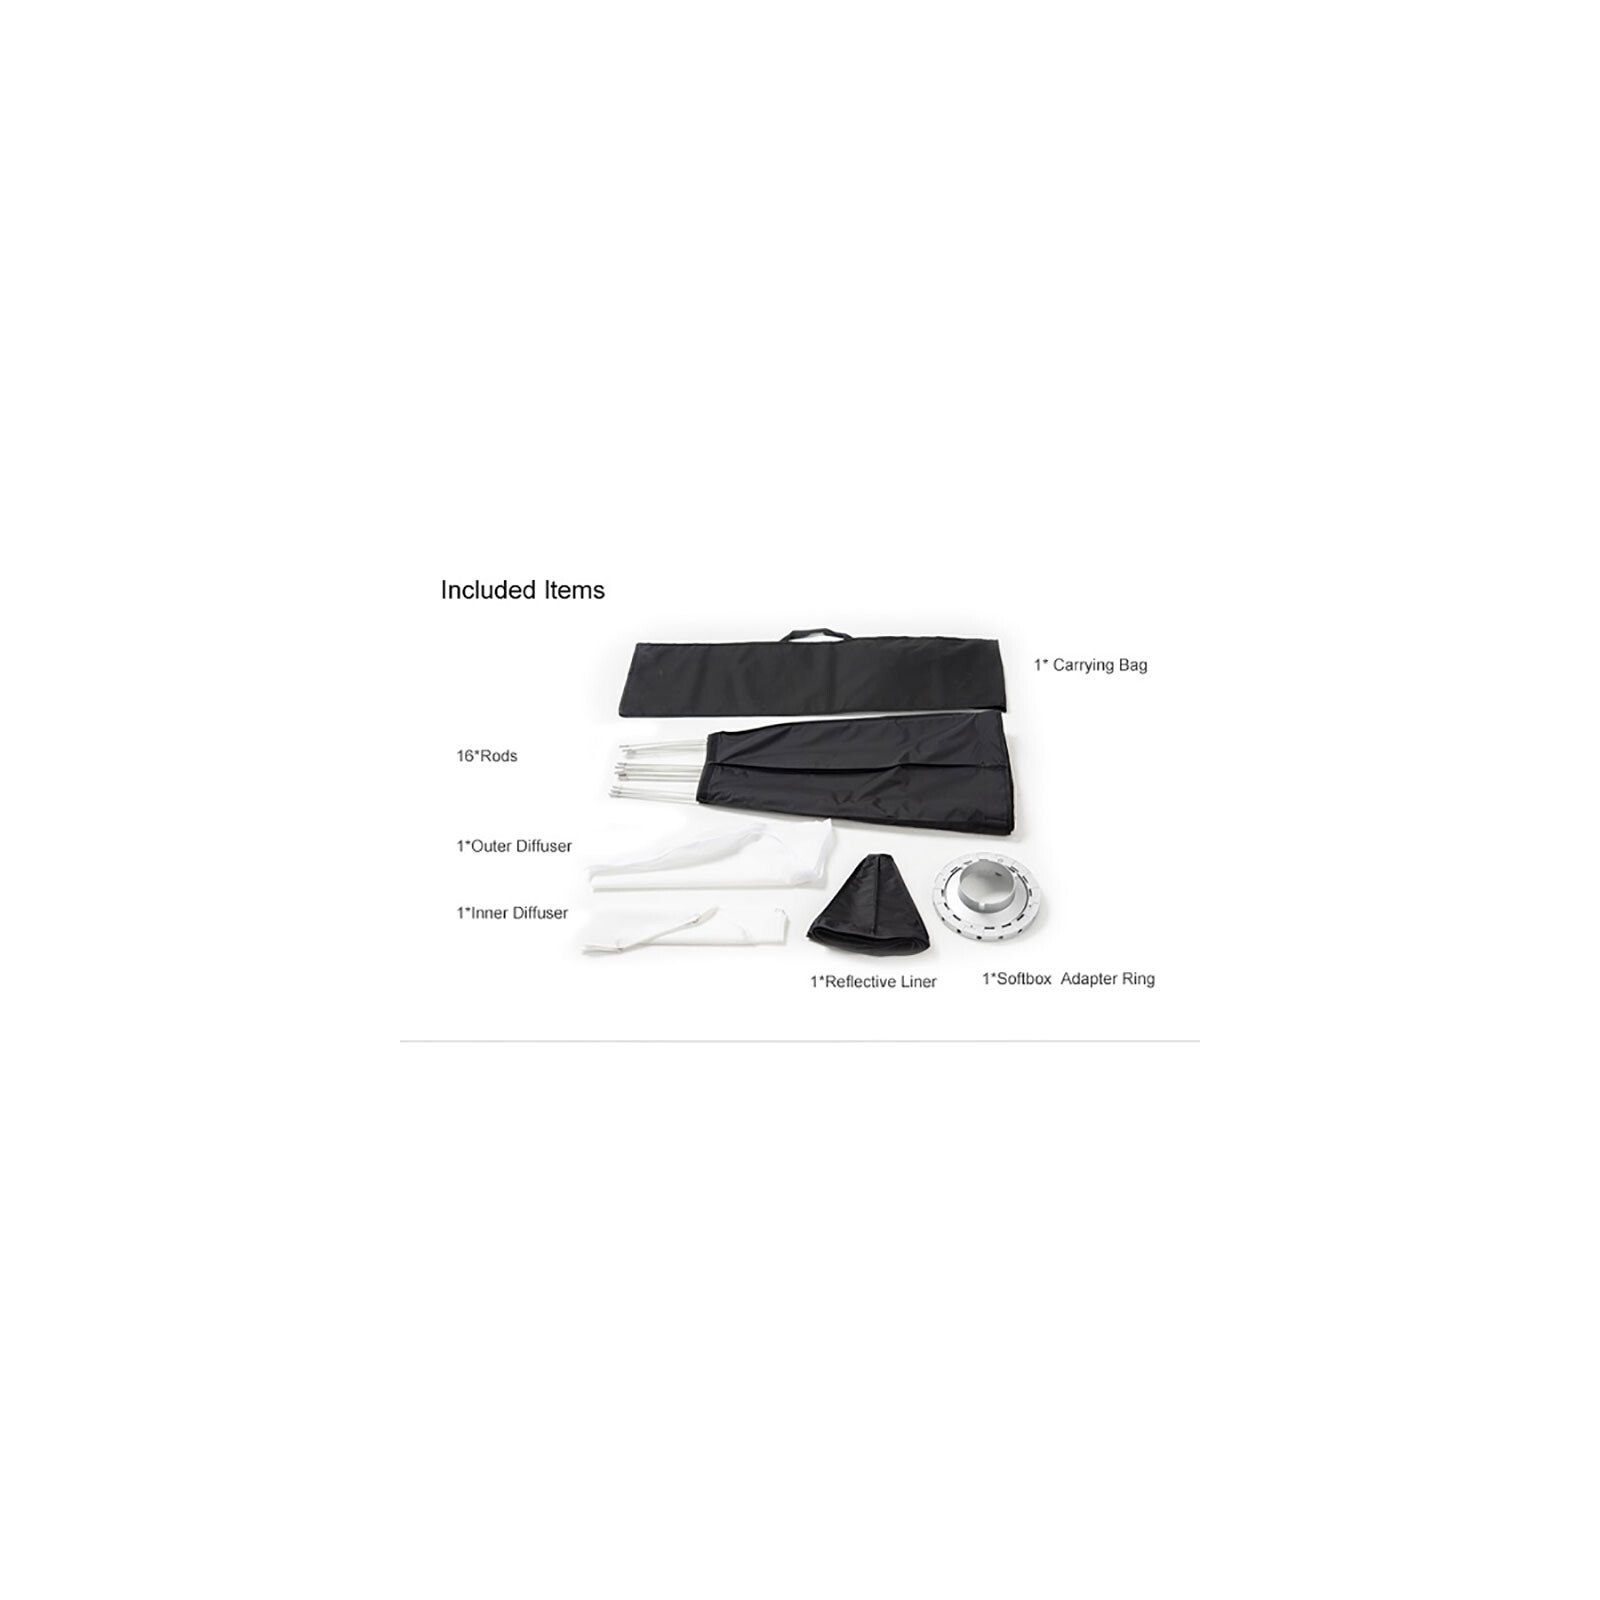 GODOX Parabolic Softbox 90 cm DM